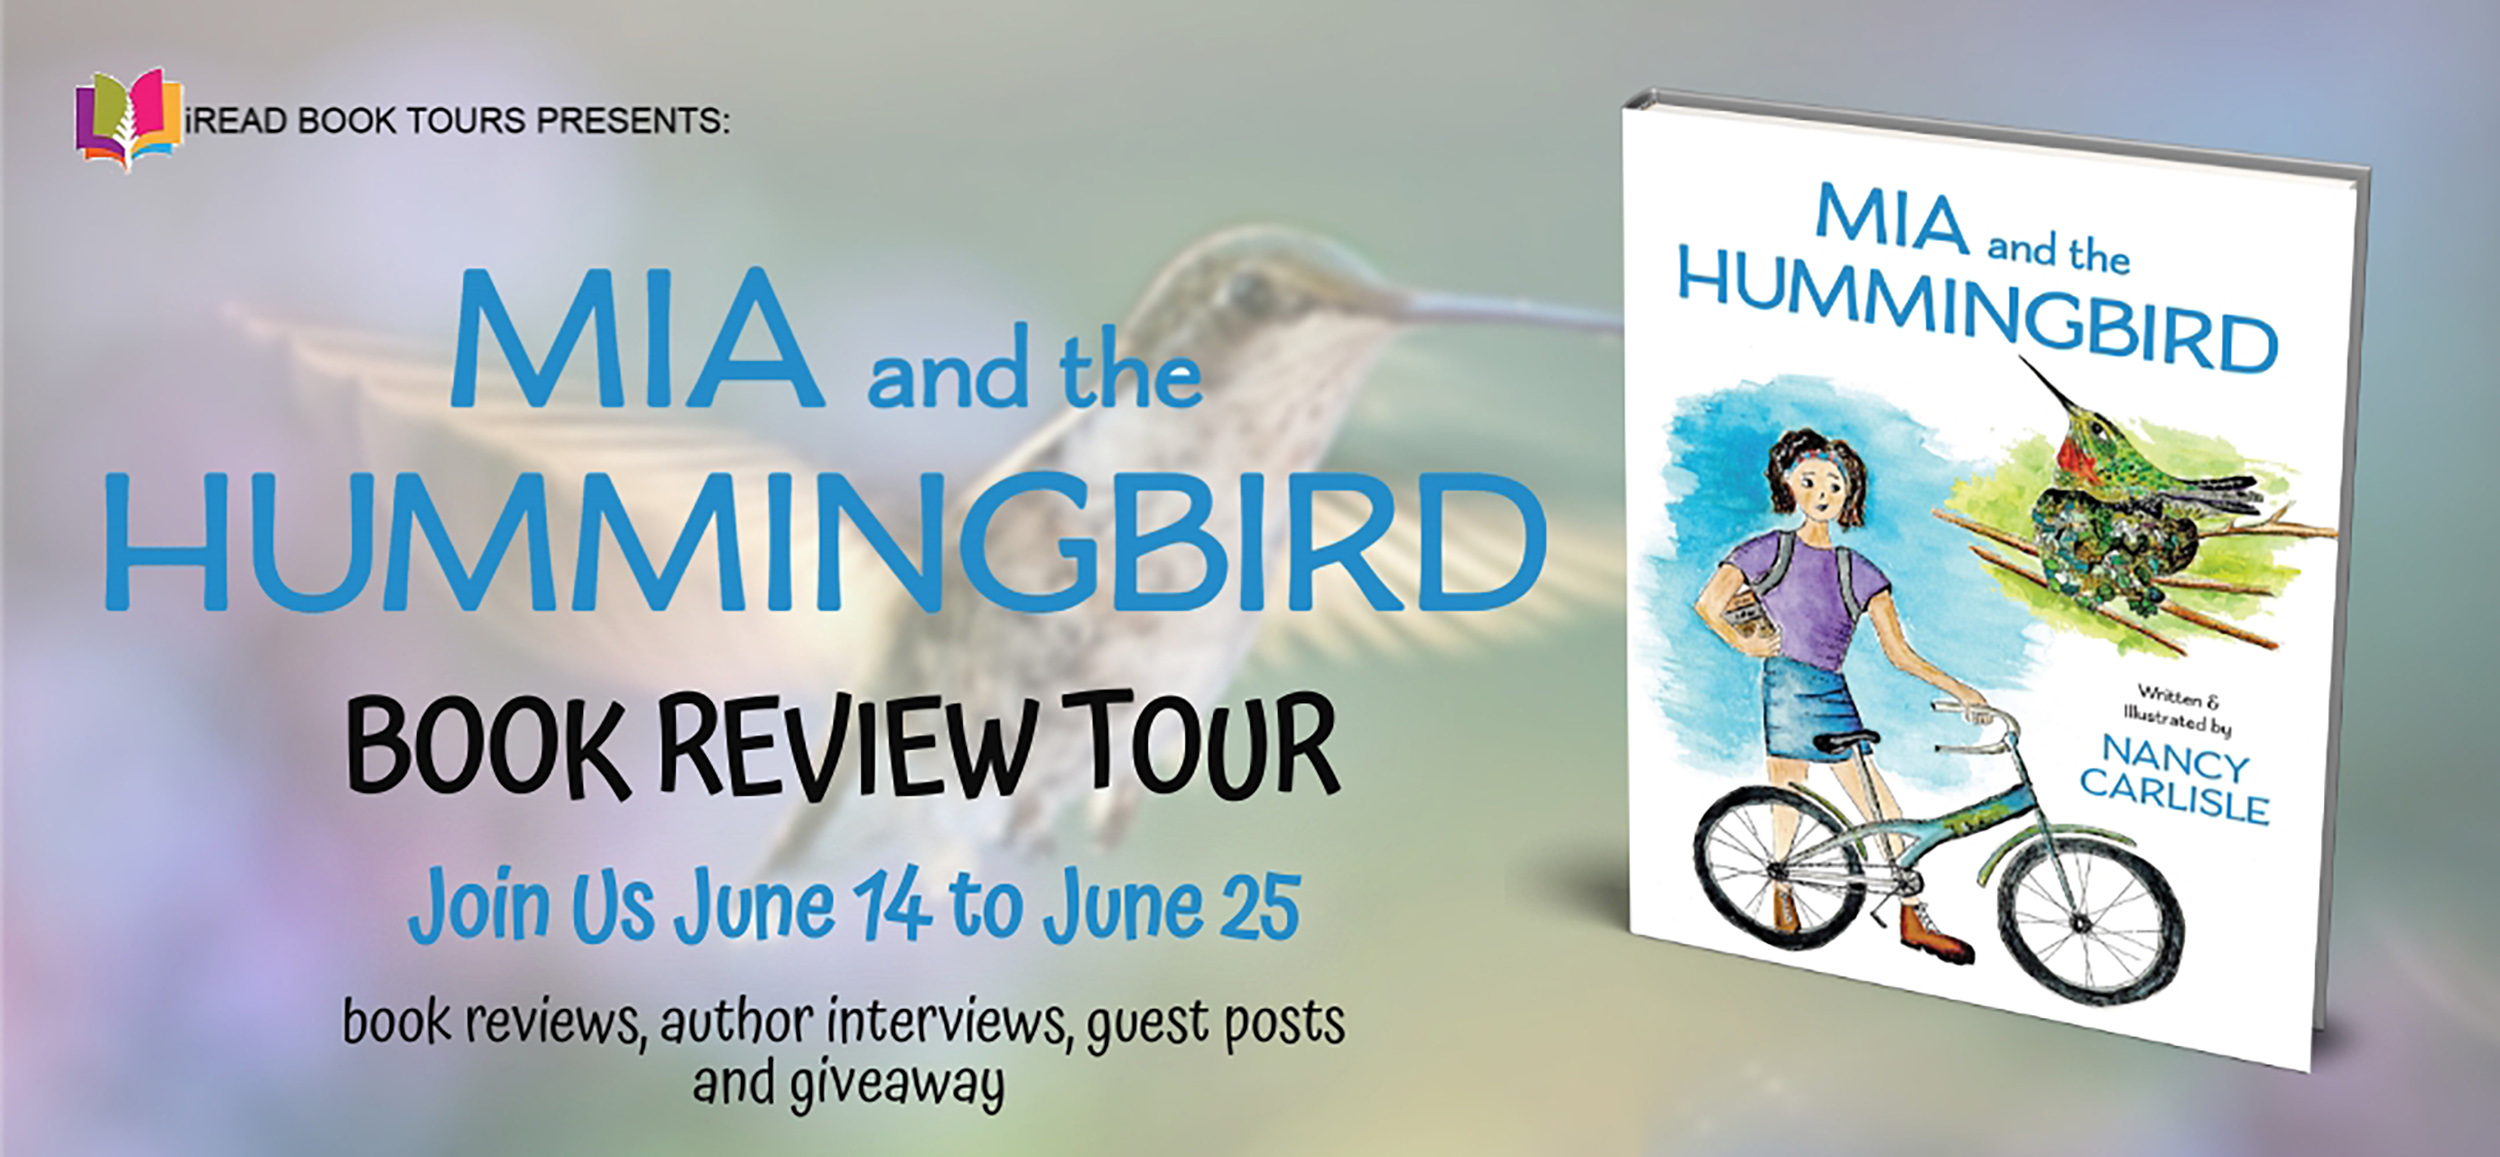 Mia and the Hummingbird Tour Banner